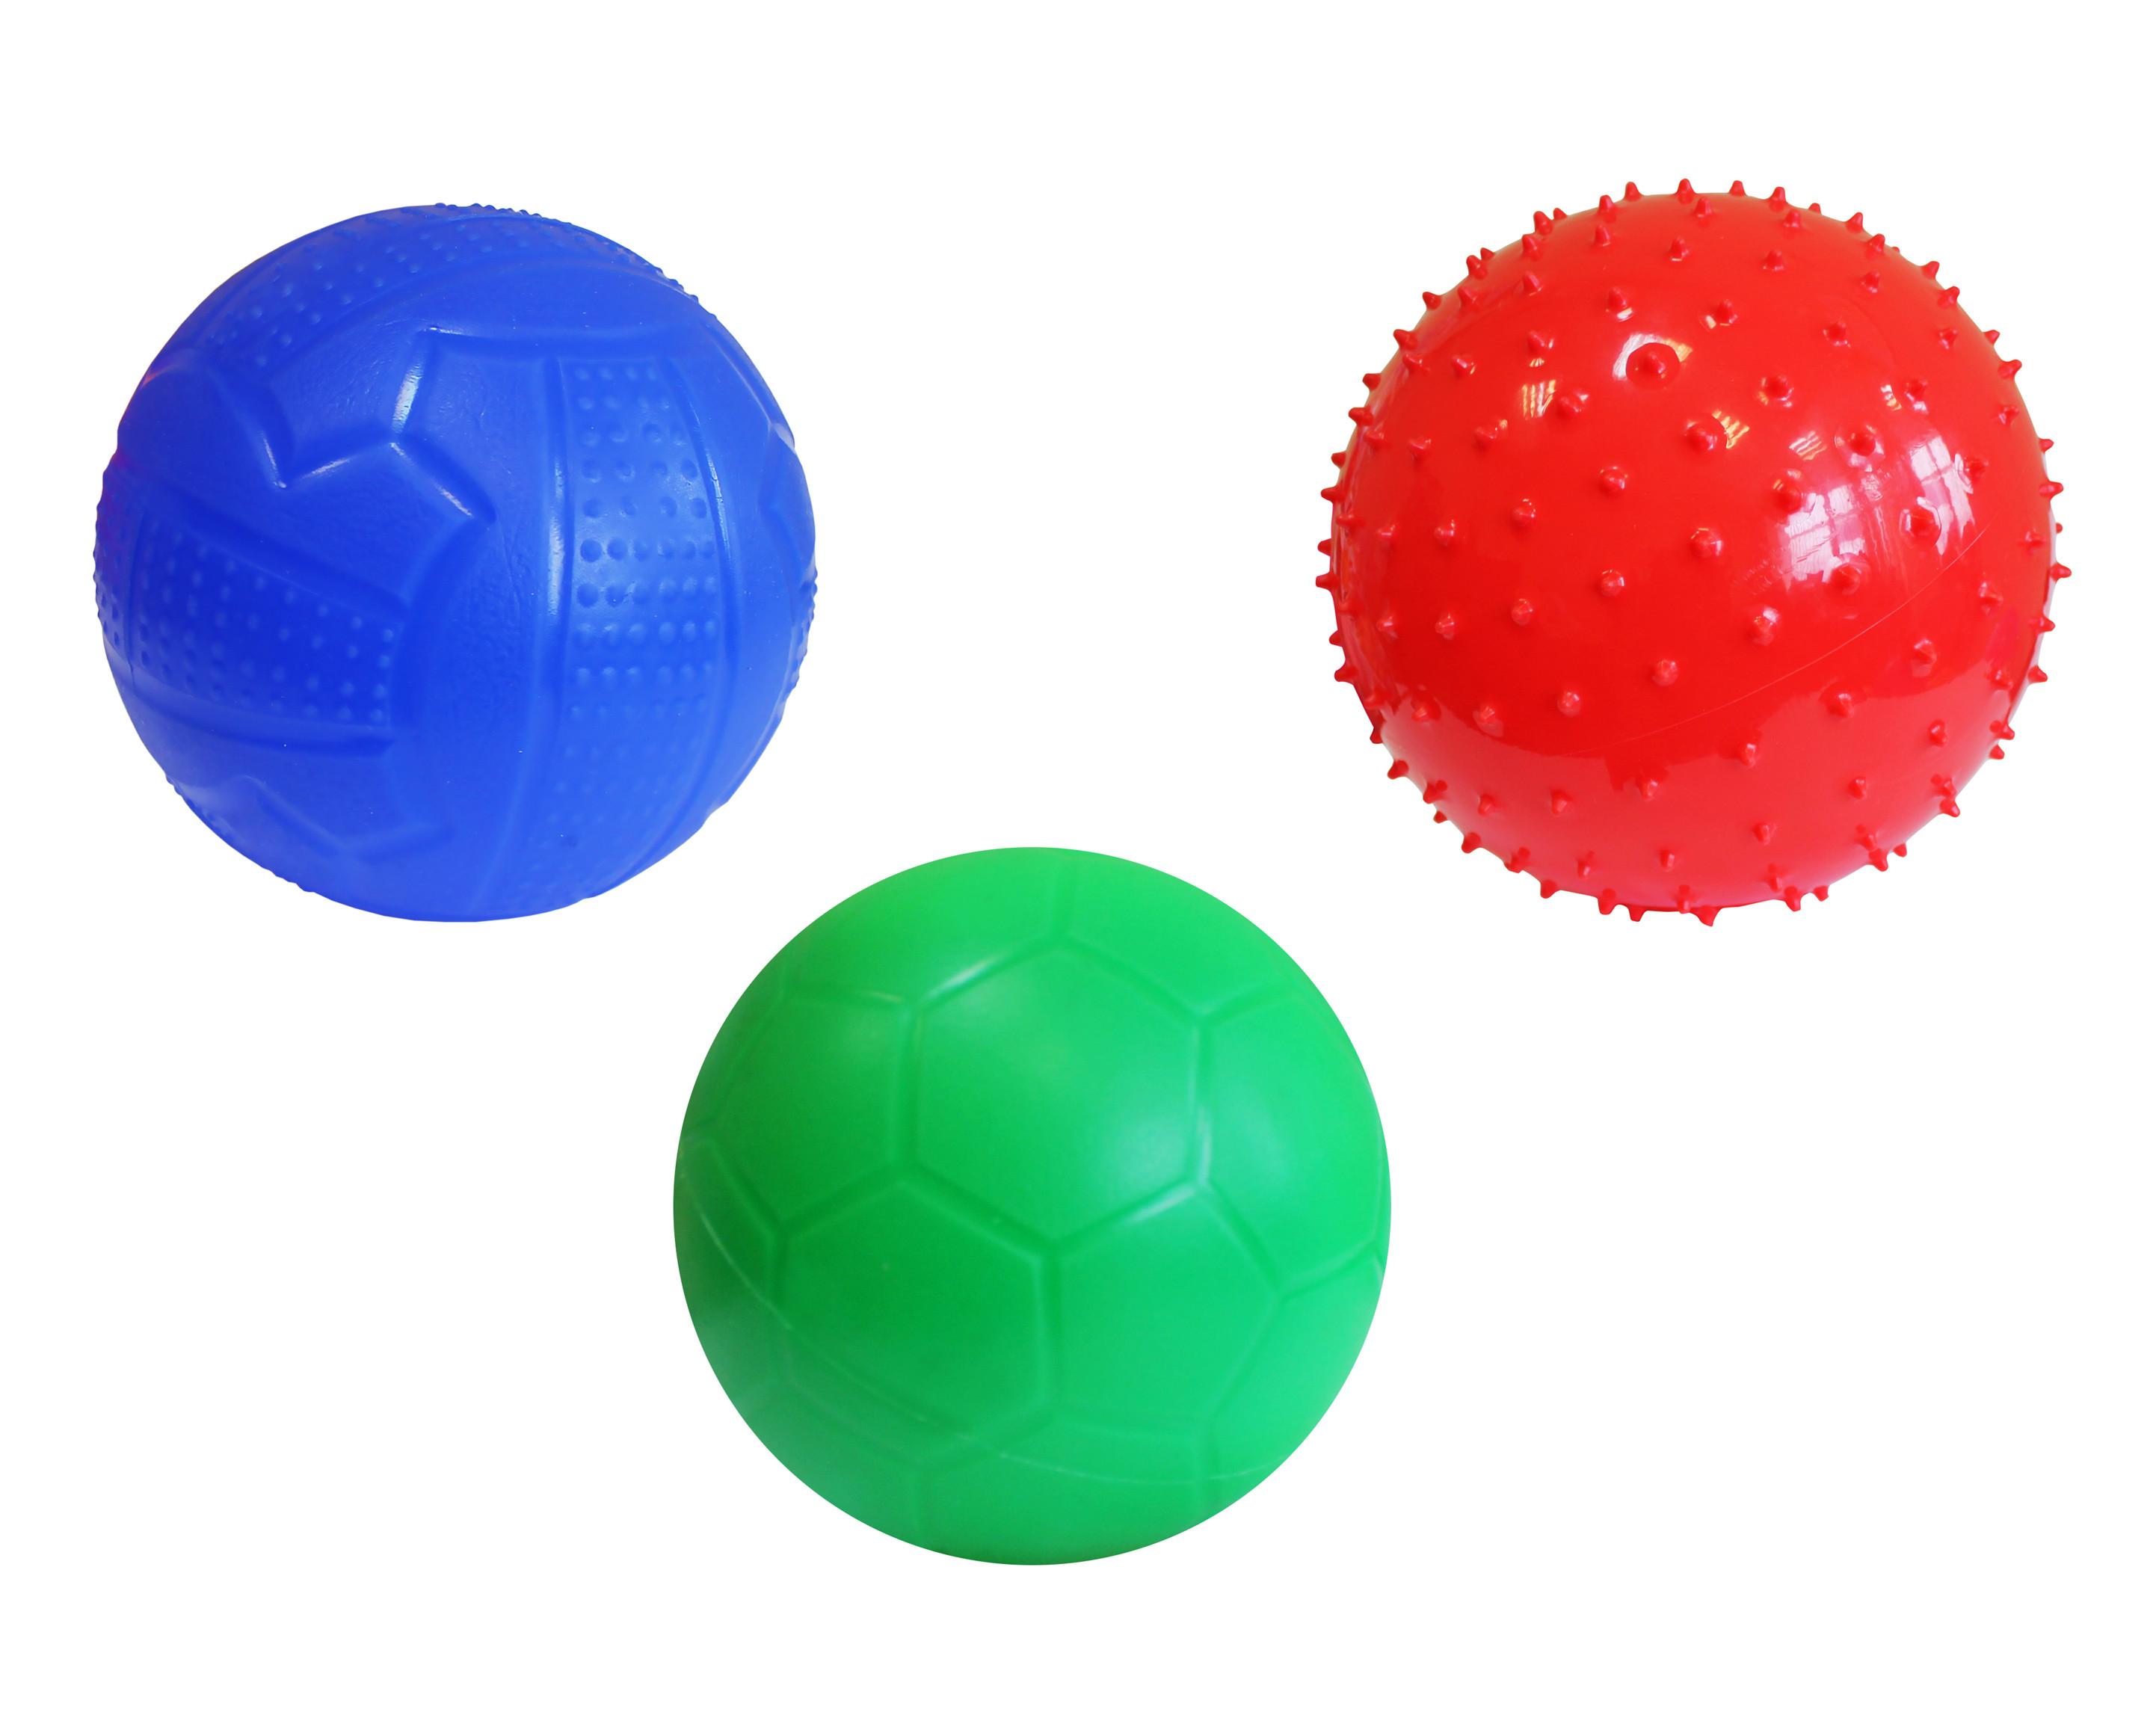 Мячи Пластмастер Мяч «Классик» Пластмастер d160 мм в асс. заглушка оцинкованная d160 мм